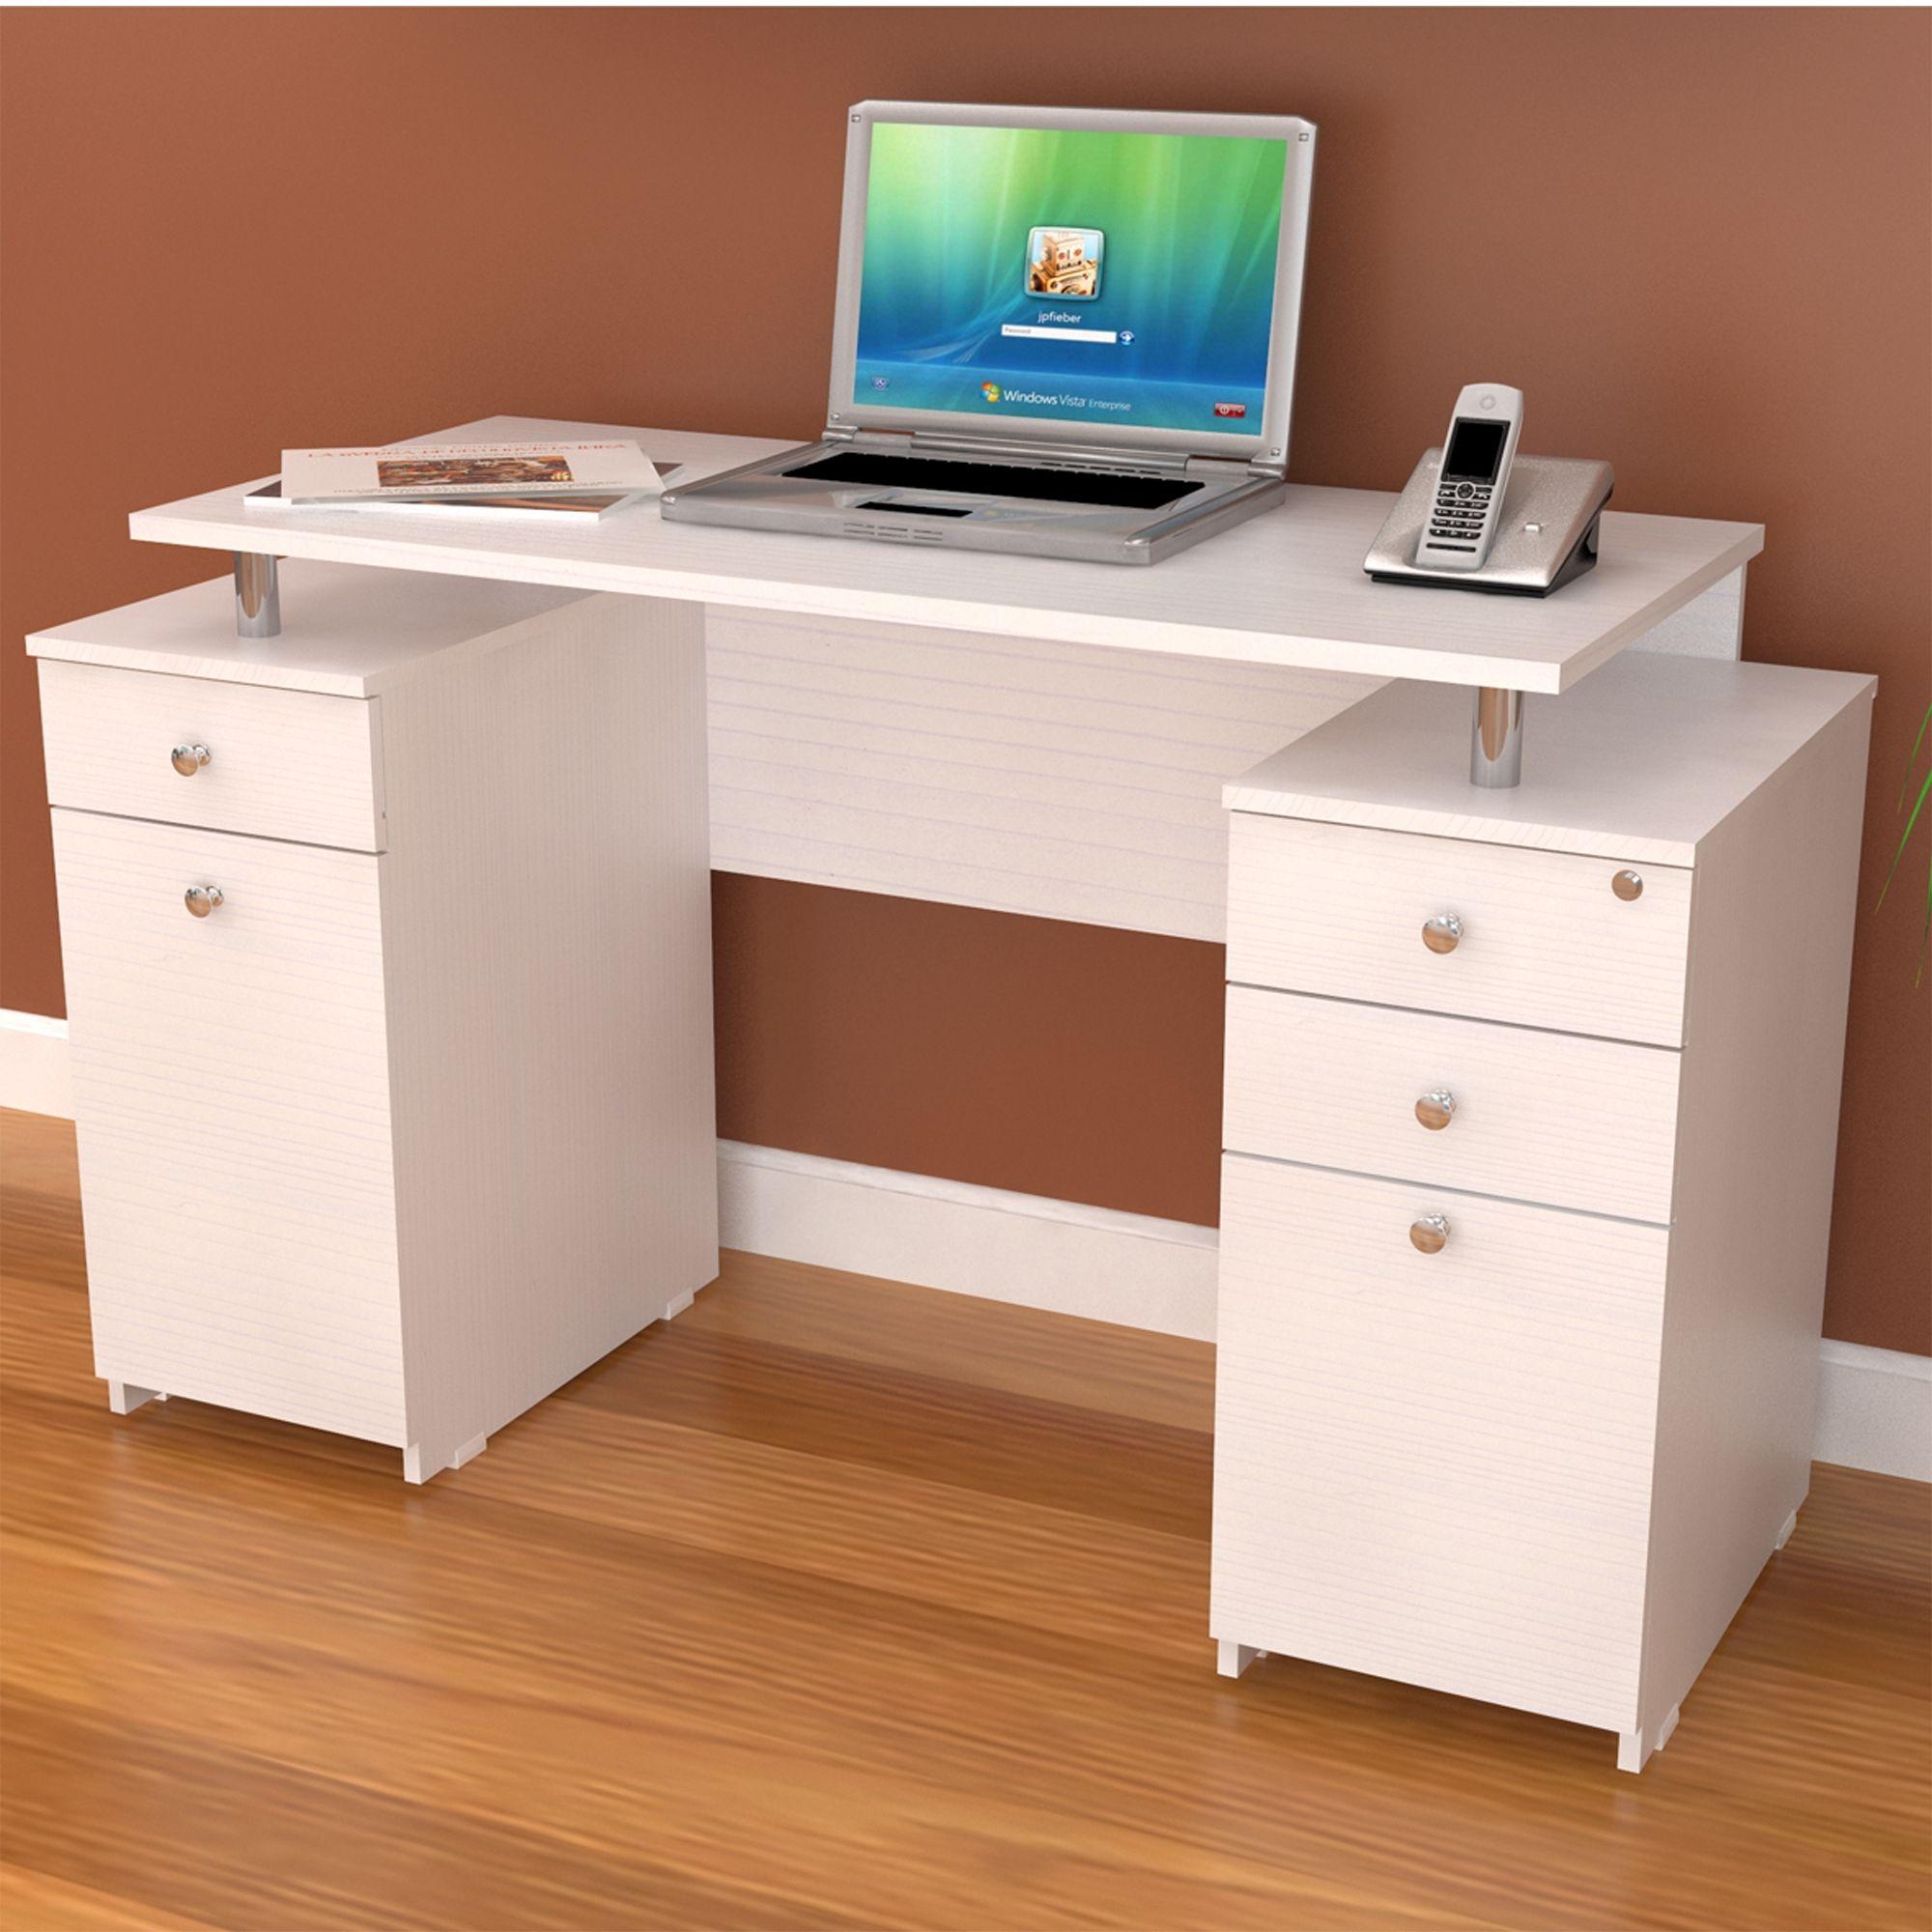 desk storage side table drawer for threshold locks computer